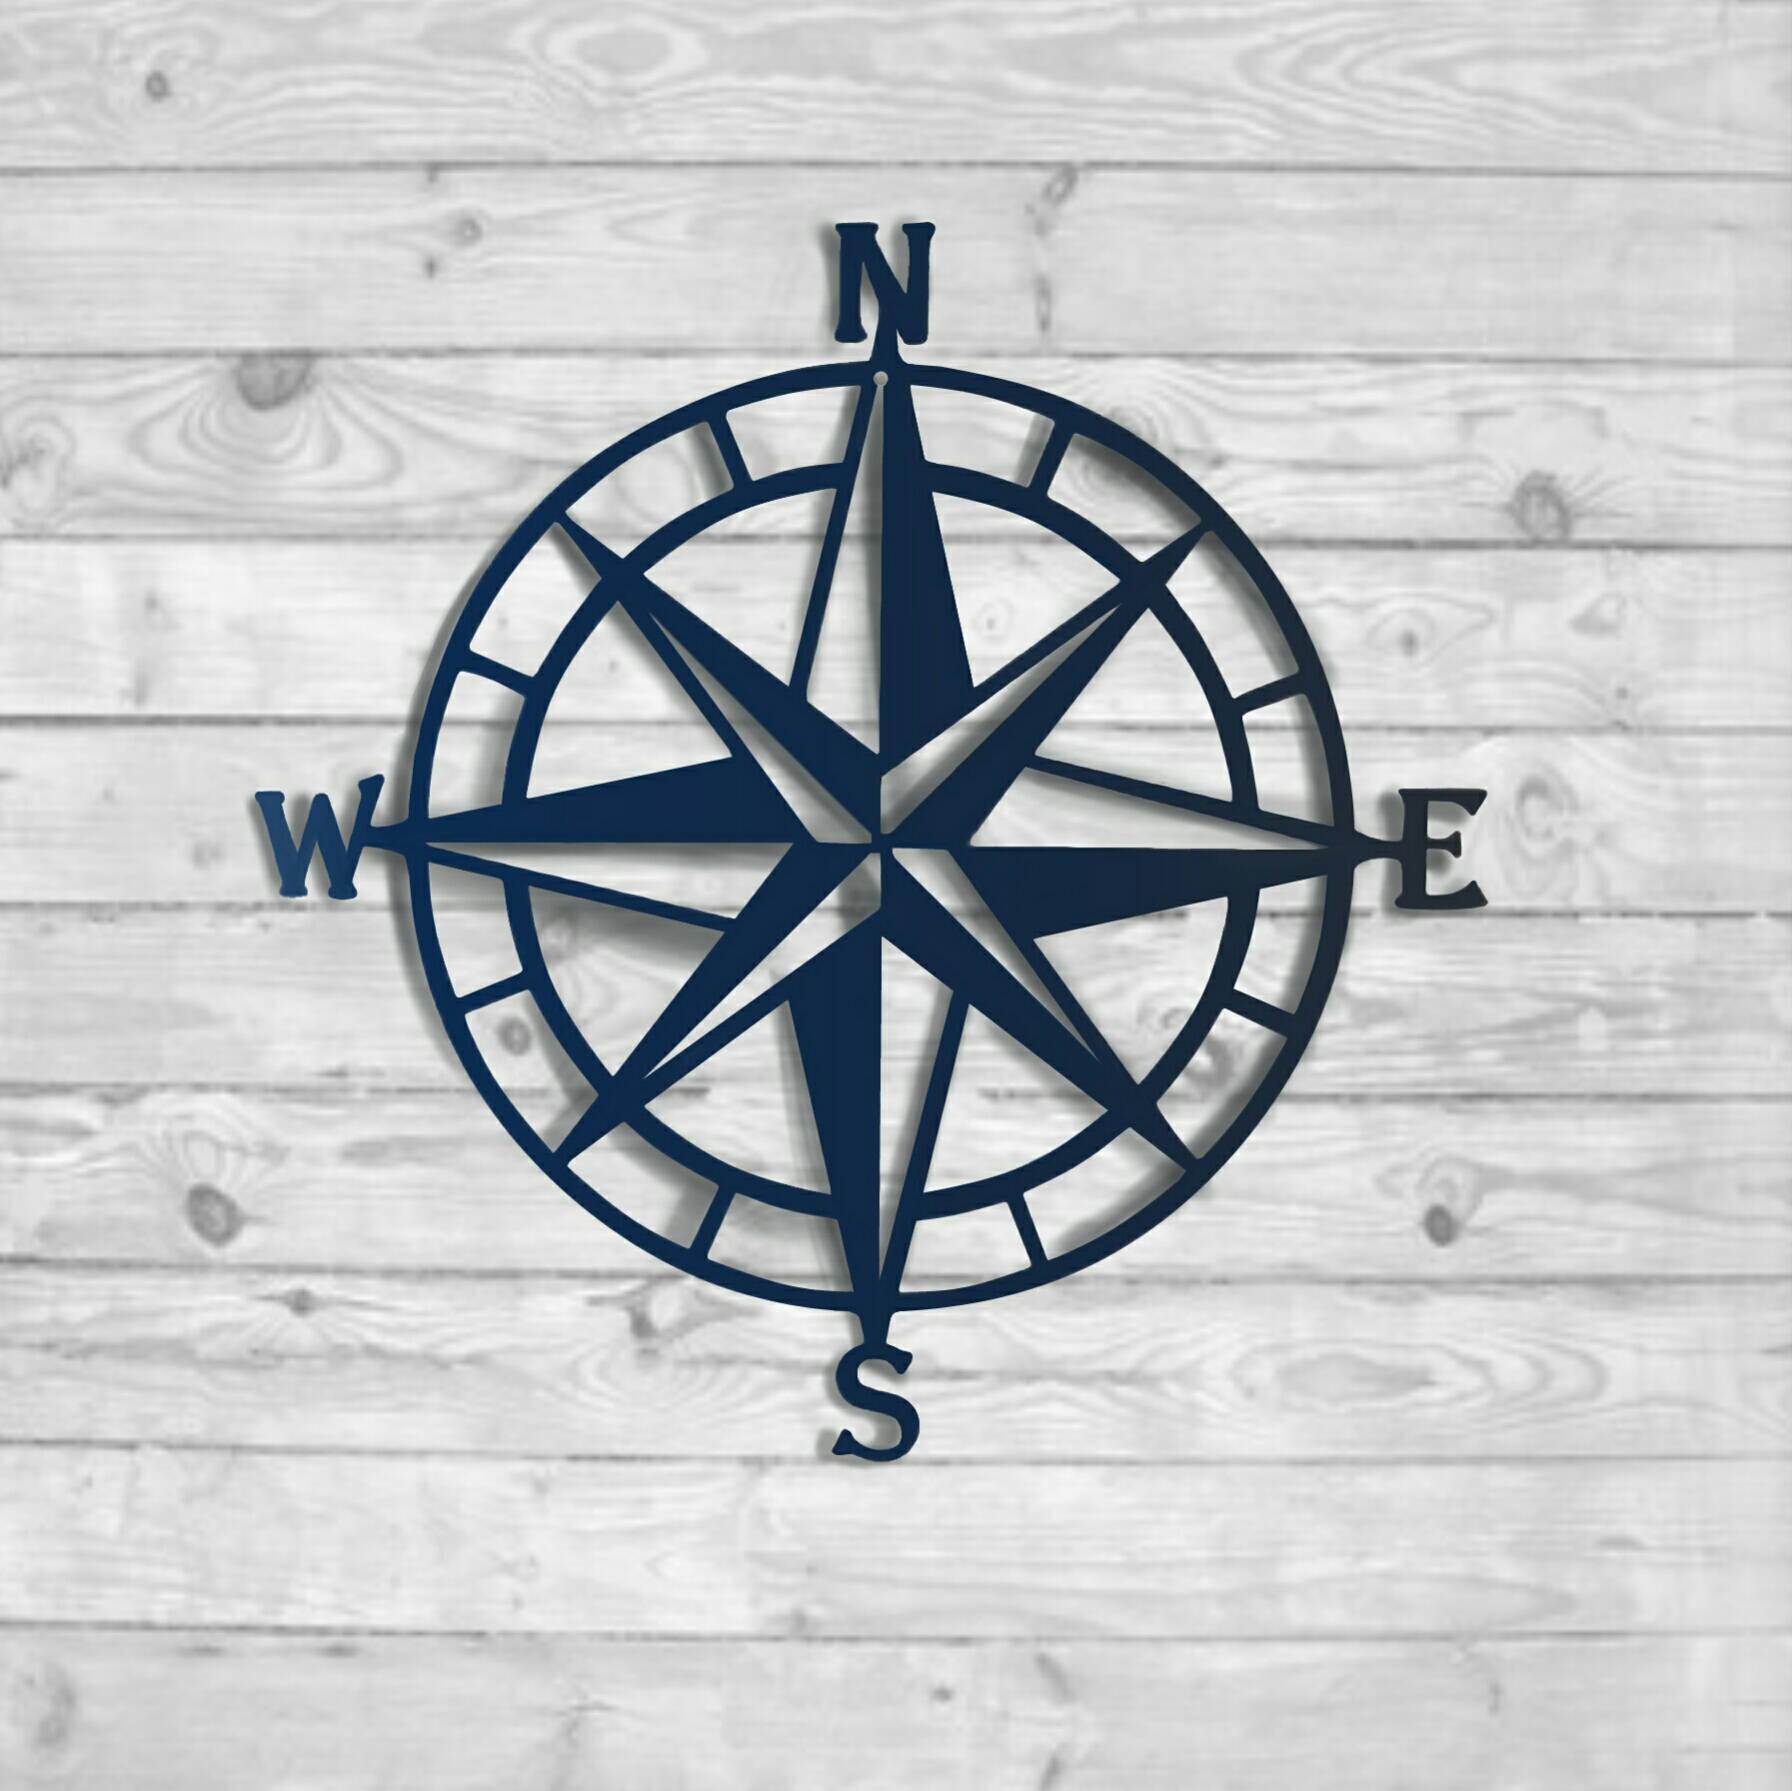 Textured Navy: Nautical Compass – Nautical Wall Art – Metal Wall Art Regarding Most Recent Outdoor Metal Wall Compass (Gallery 3 of 20)